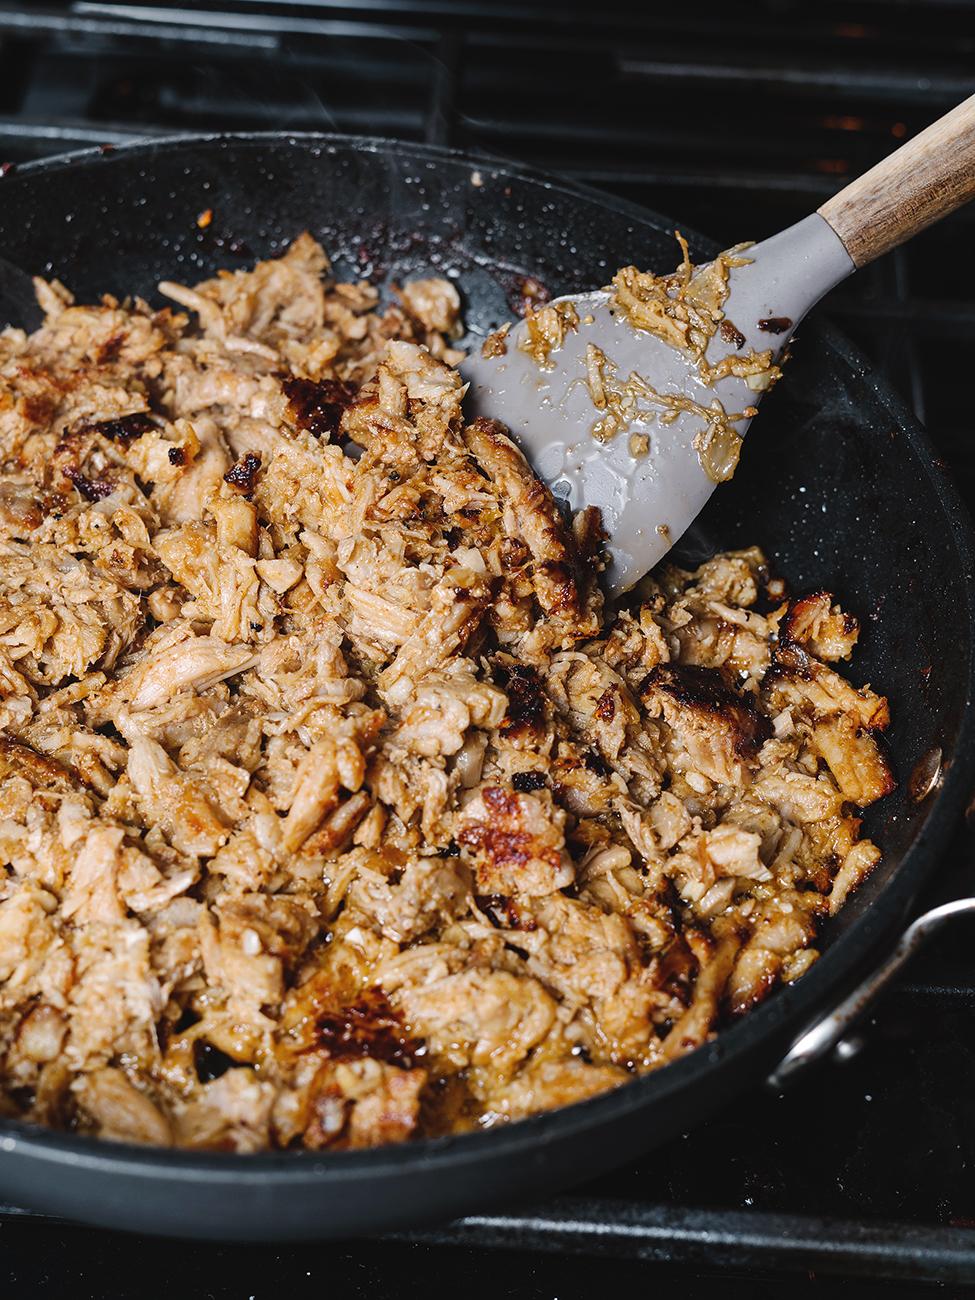 pan cooking pulled pork